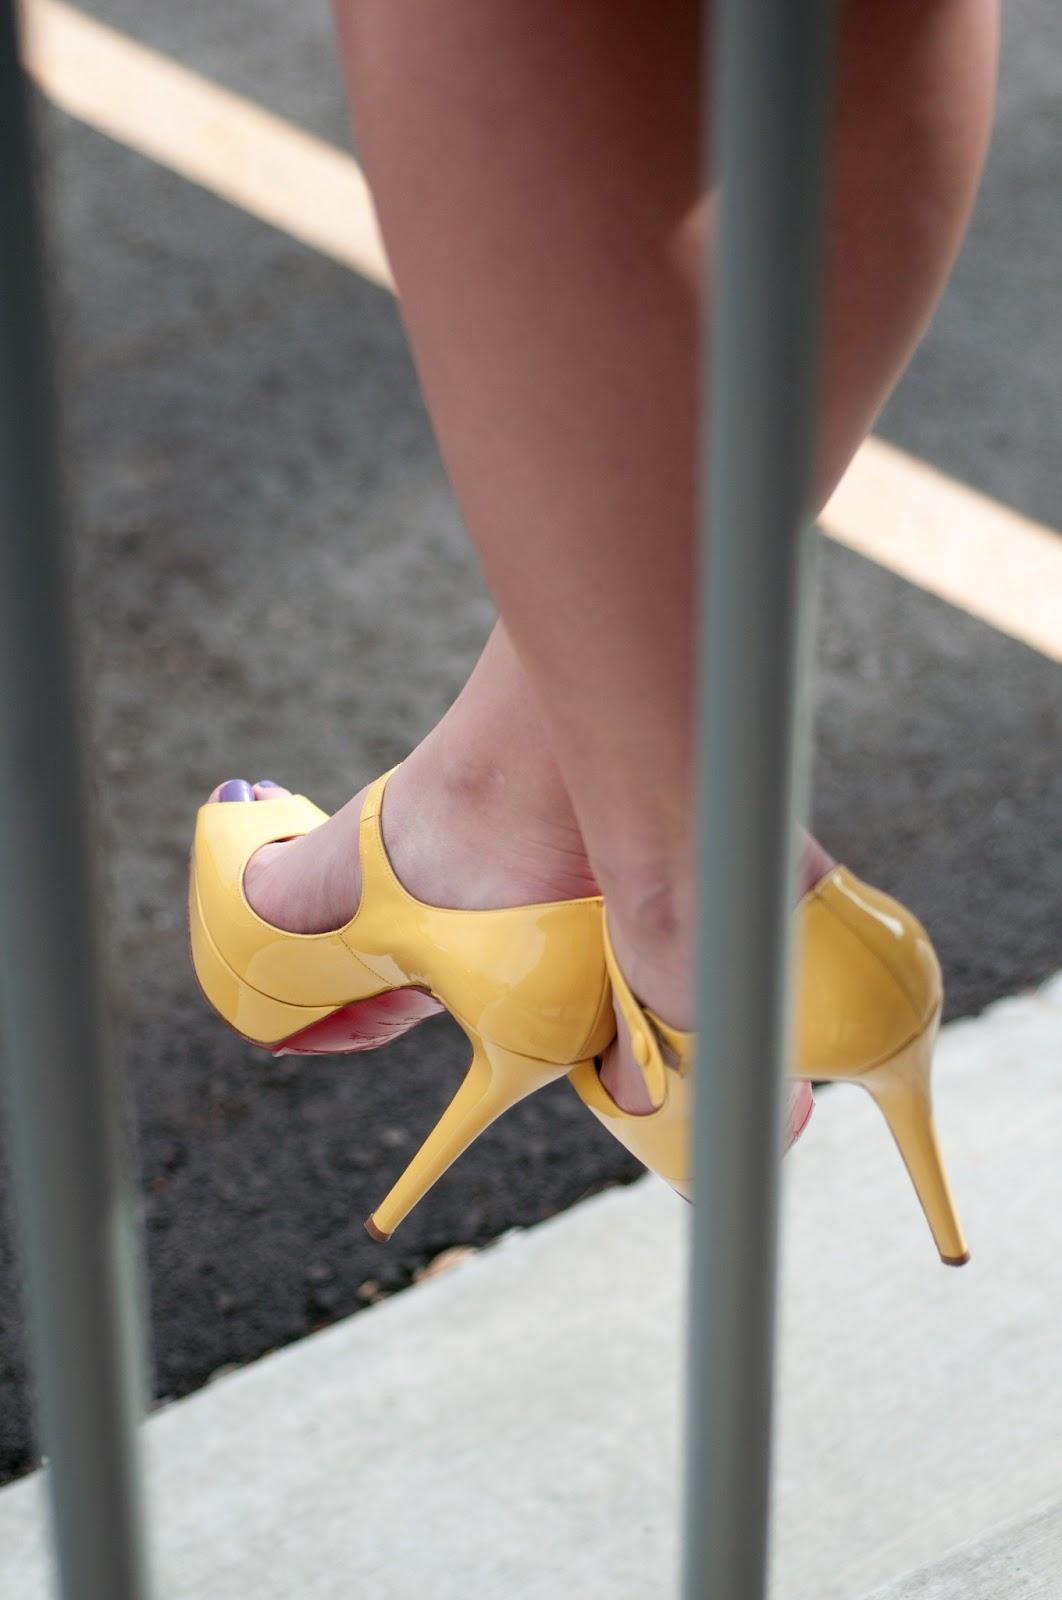 style blog, fashion blog, style, fashion, mens fashion, mens style, womens style, jcrew, jcrew short sleeve shirts, jcrew mens clothes, css, california cheap skate, burberry, burberry watches, burberry mens watches, cole haan, mens cole haan watches, shabby apple, shabby apple pencil peplum dress, peplum, peplum dress, Christian louboutin, yellow heels, red soles, christian louboutin nana, nana shoes, mary janes, mary jane shoes, peep toe heels, prada, prada cat eye sunglasses, prada sunglasses, kate spade, kate spade purse, teal kate spade purse, floral necklace, stripes, floral, top handle purse, kate spade new york